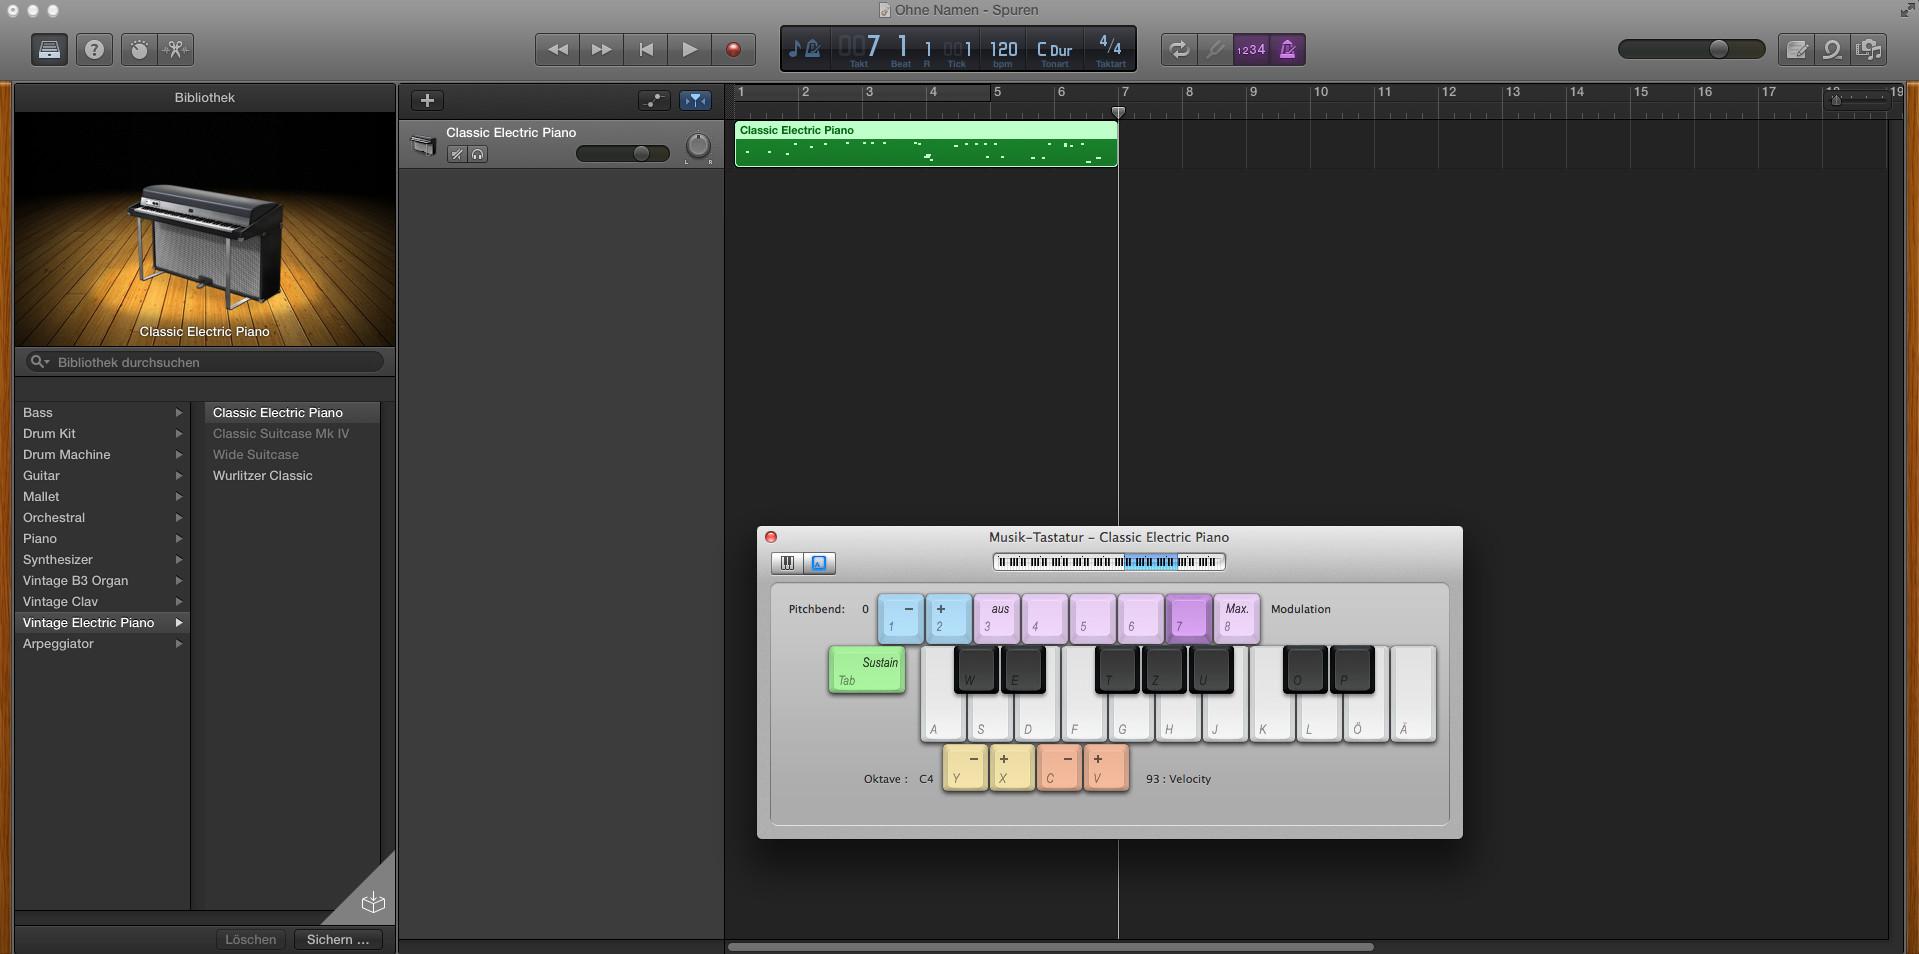 Screenshot 1 - GarageBand (Mac)